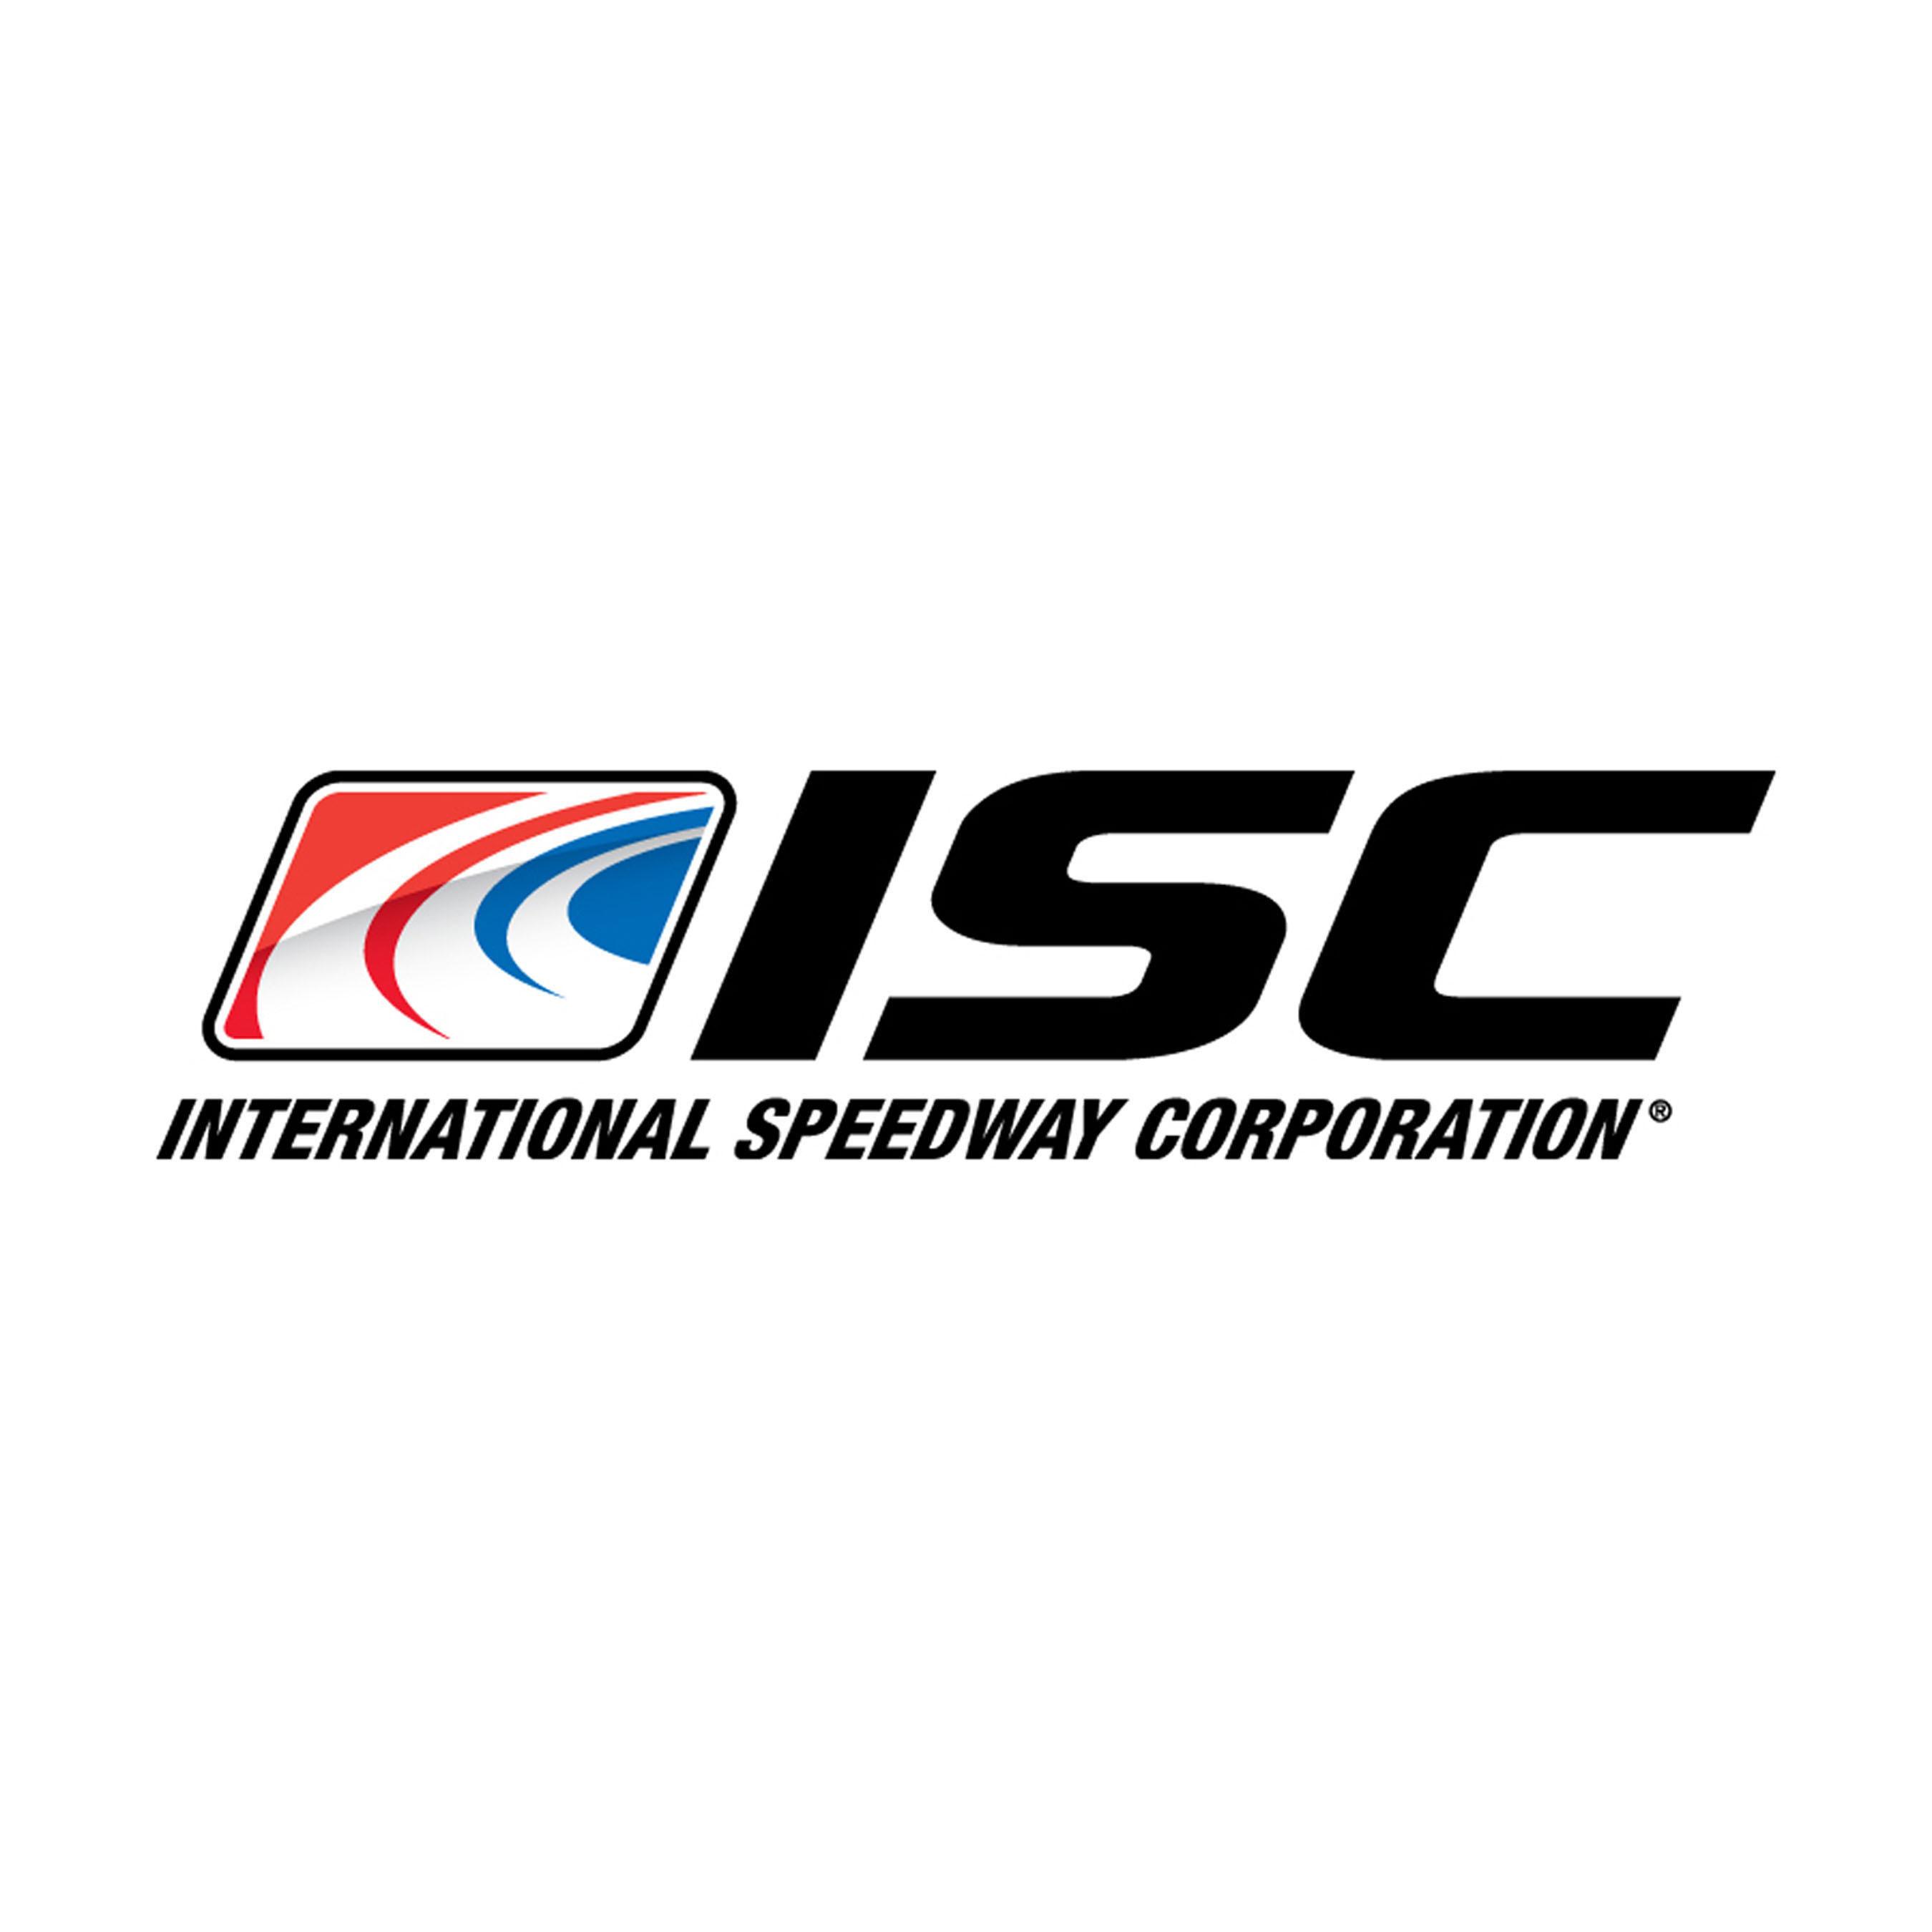 International Speedway Corporation New Corporate Logo